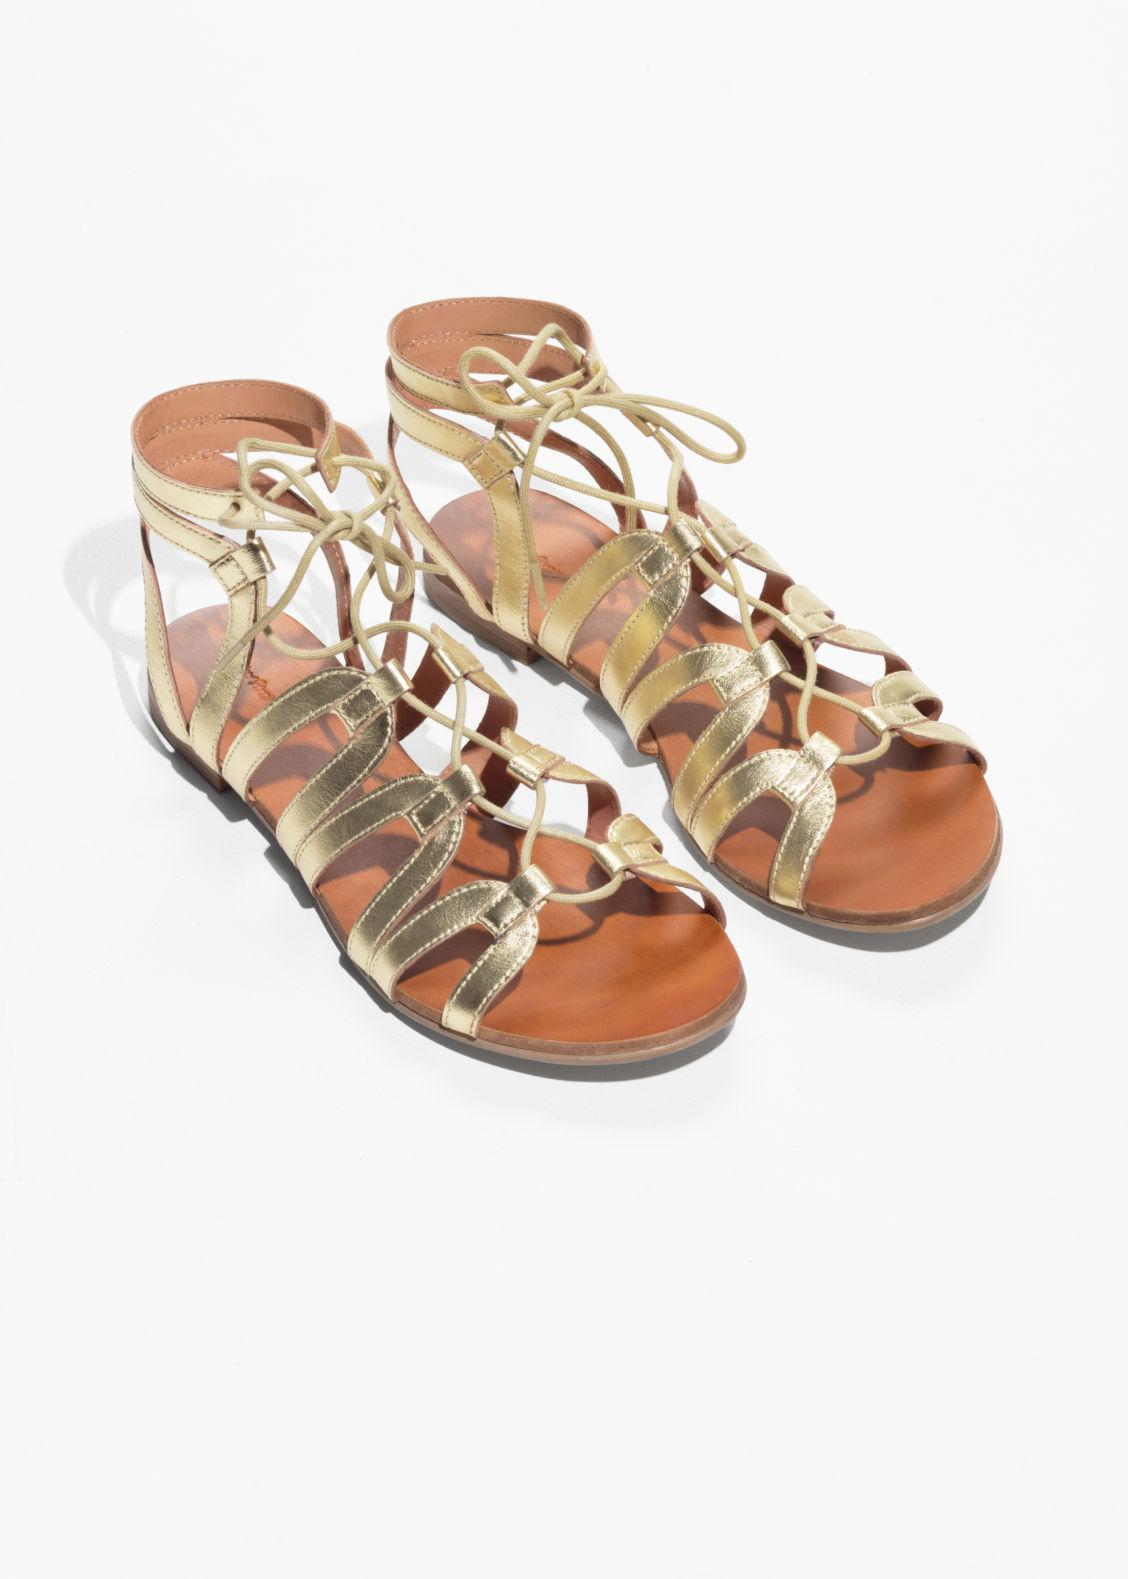 & OTHER STORIES Lacing Sandals - Gold Calidad de envío gratis Outlet Clásico en venta fyP1W6TSJT